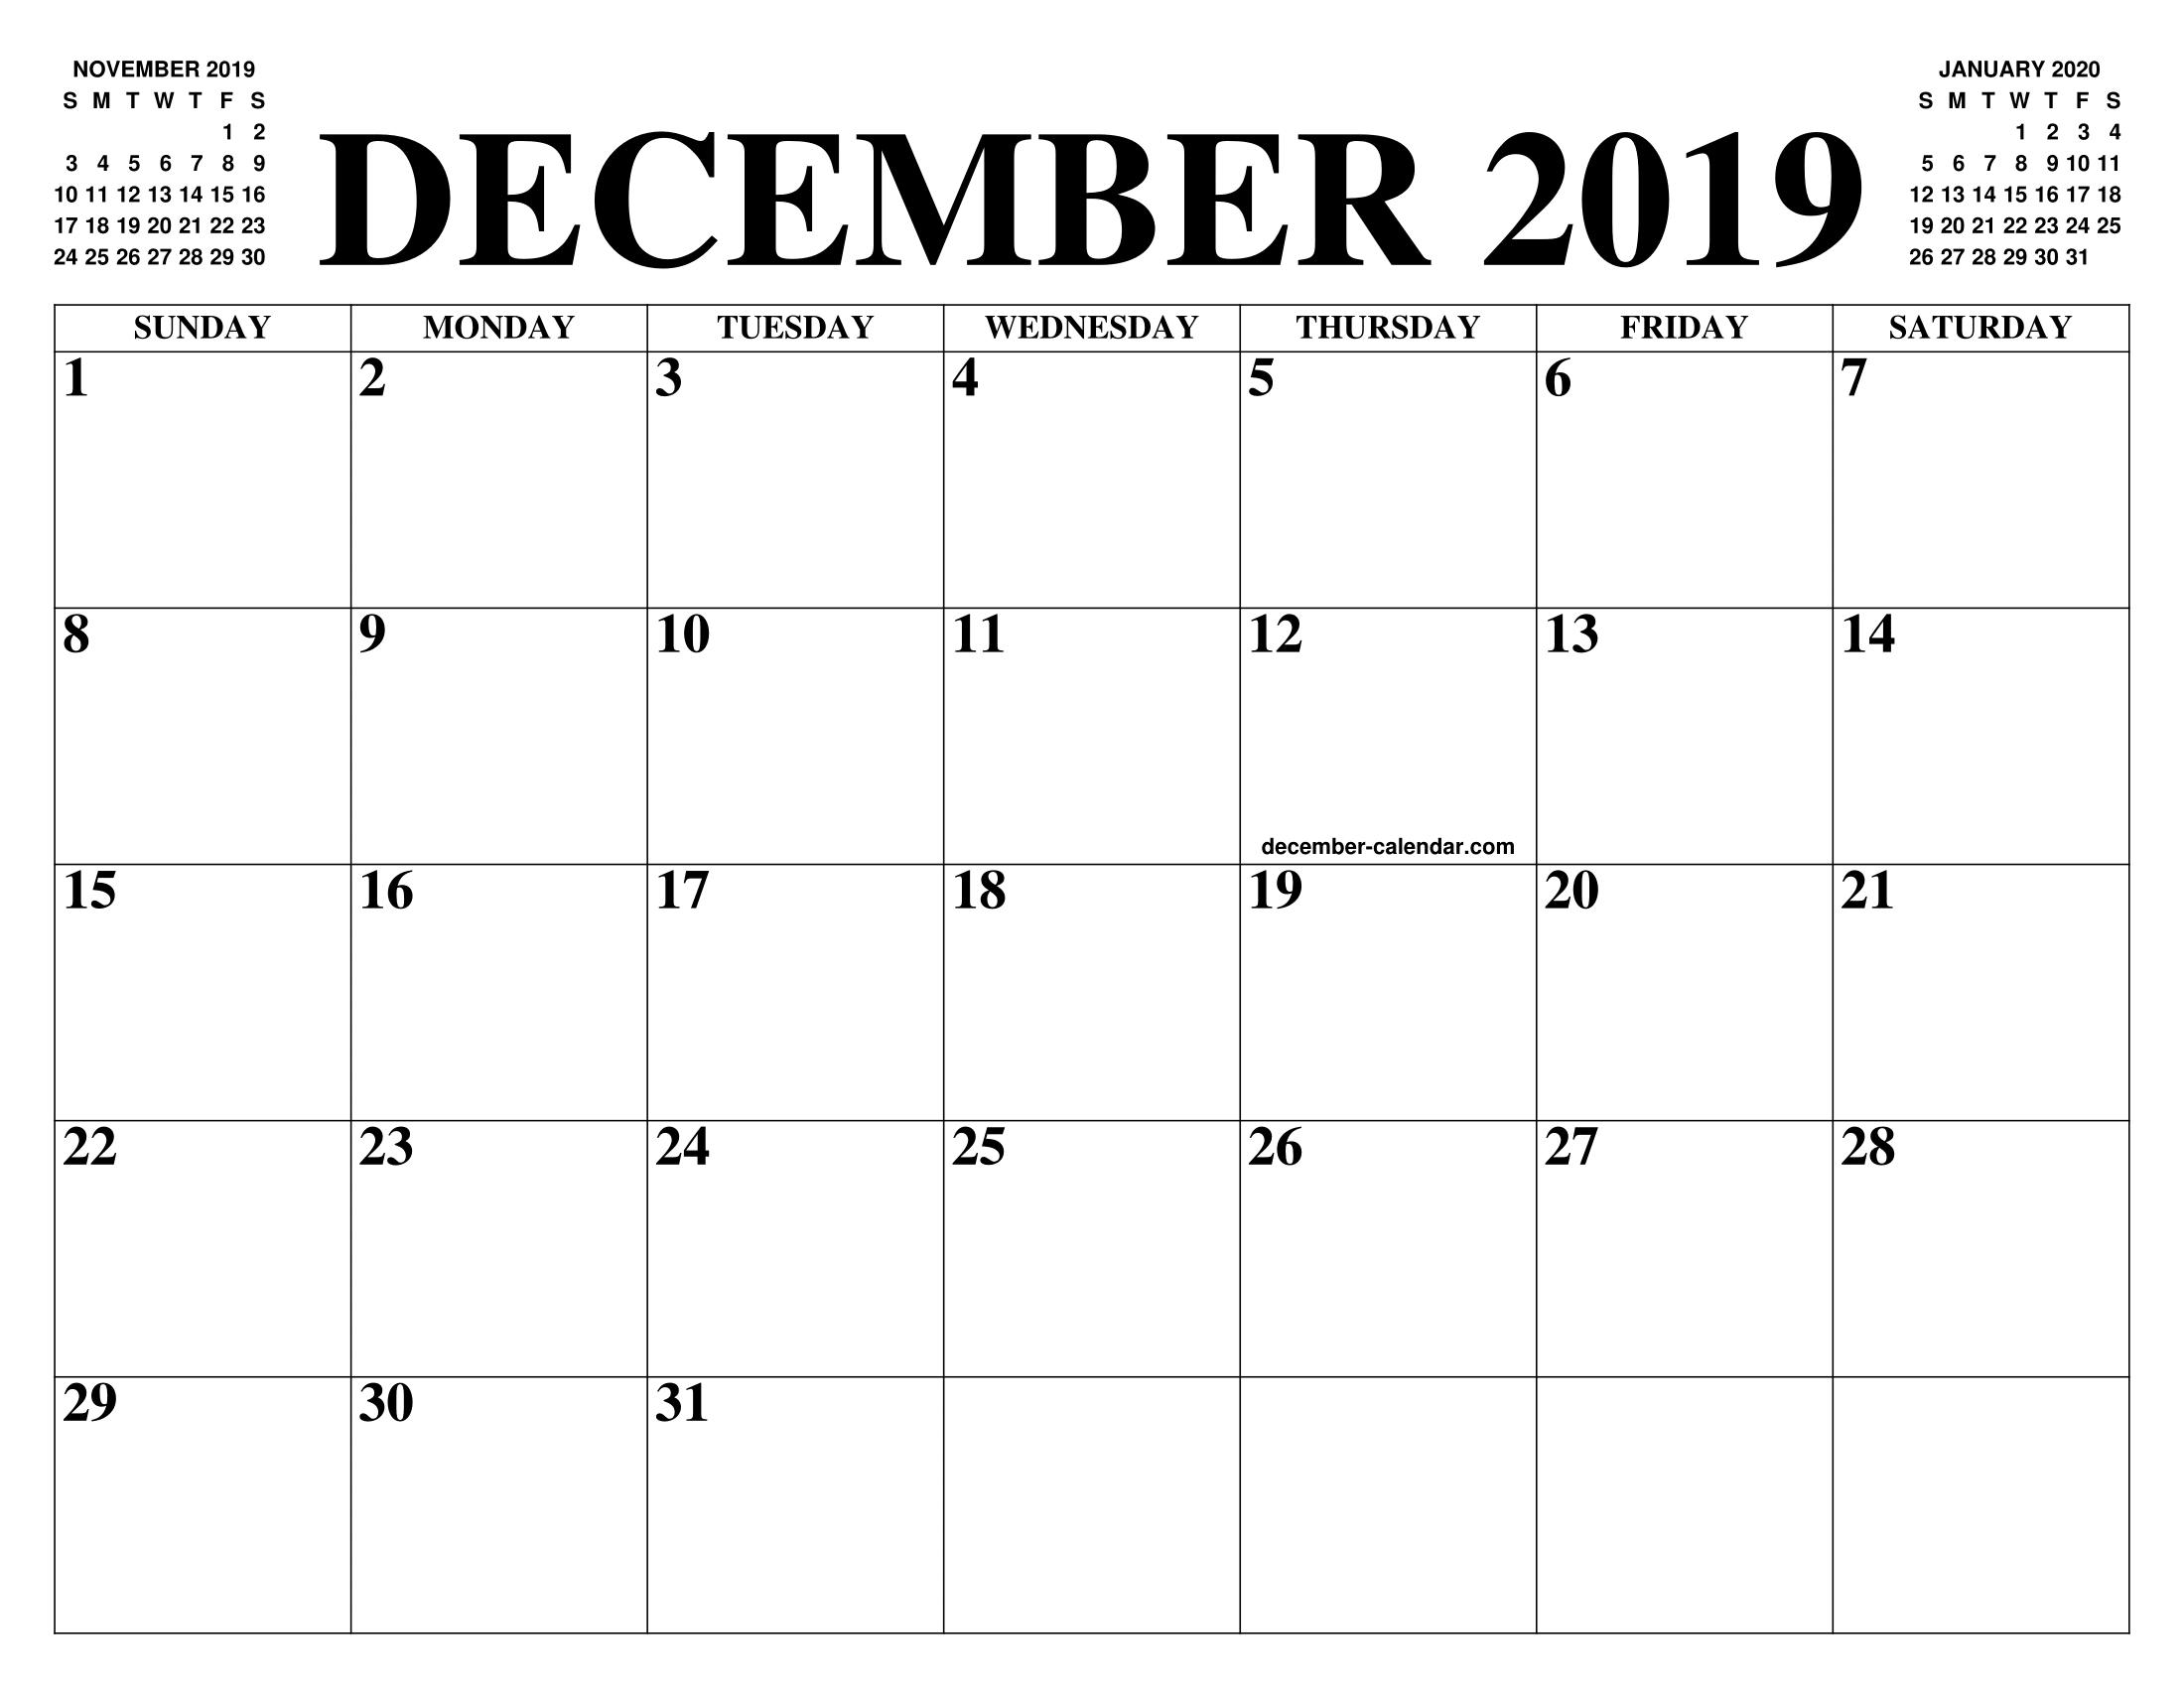 Calendar December 2019 January 2020.December 2019 2020 Calendar Of The Month Free Printable December